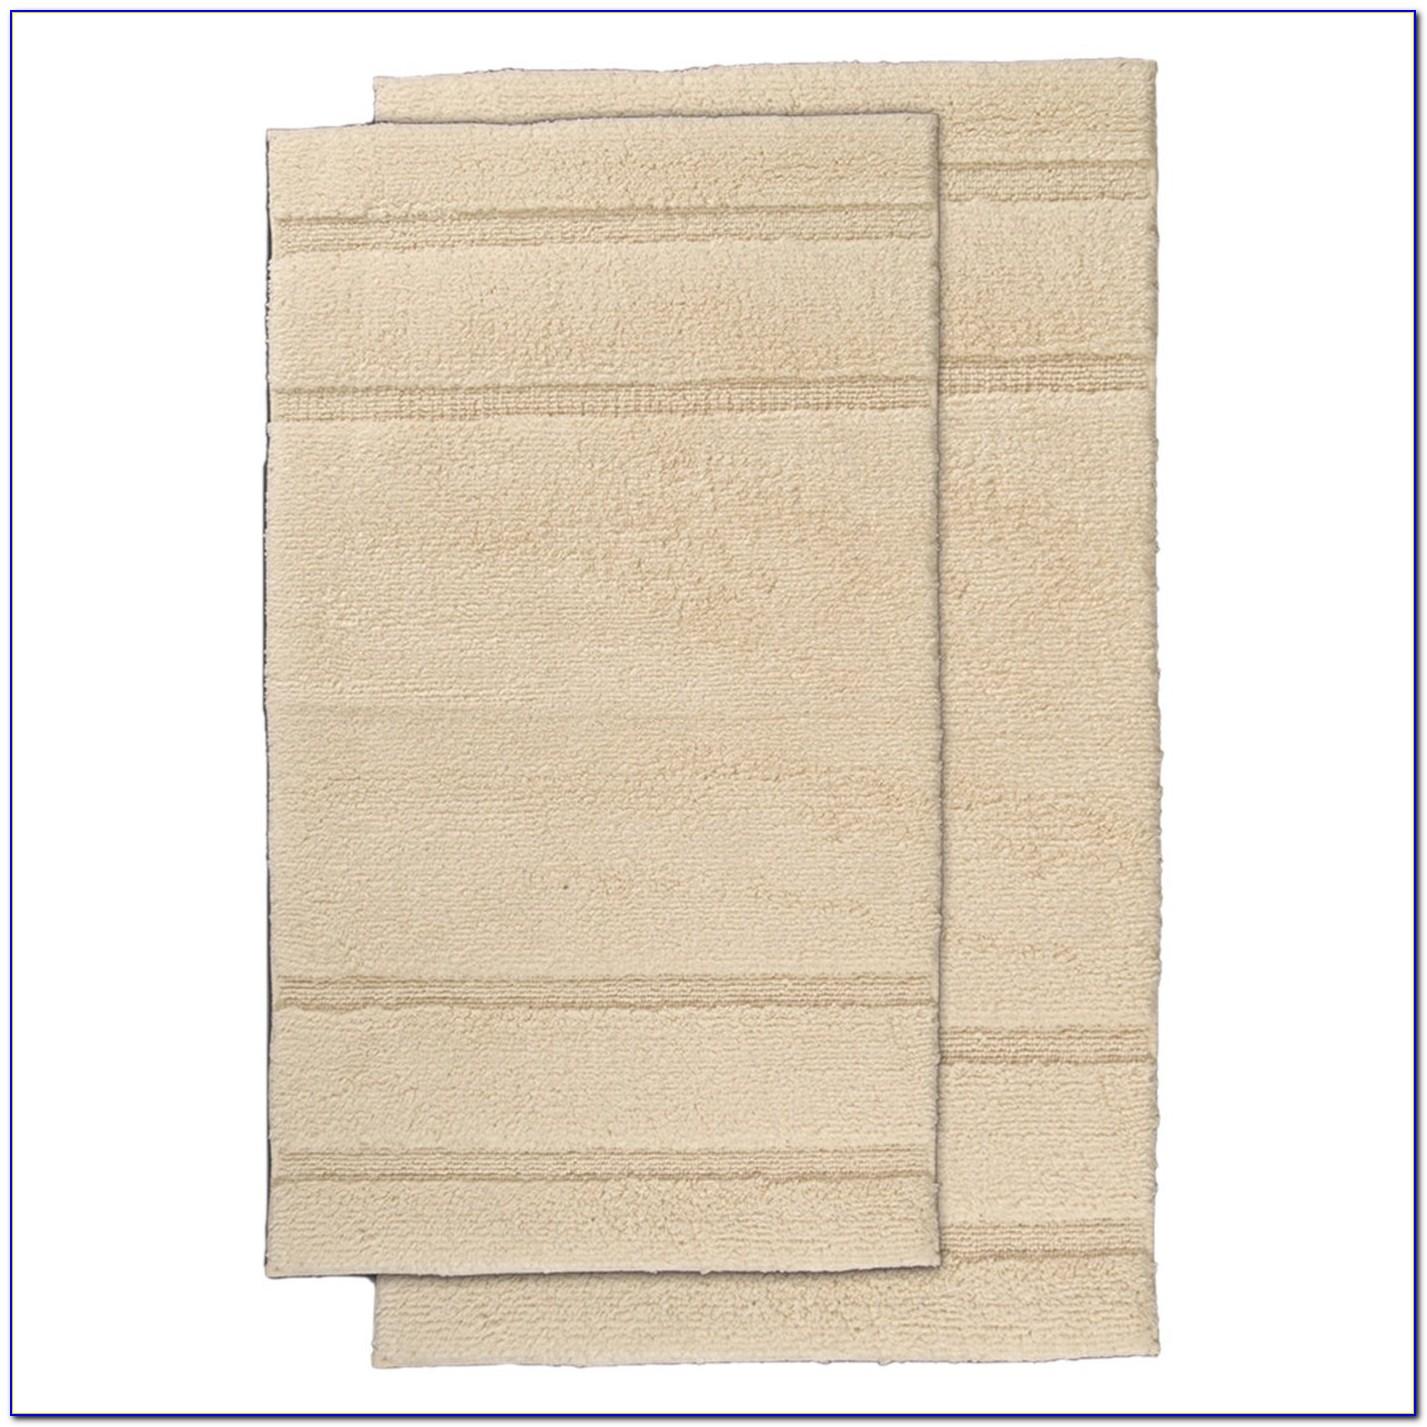 Washable Bathroom Carpet 28 Images Washable Bathroom Carpet Cut To Fit Rugs Home Design